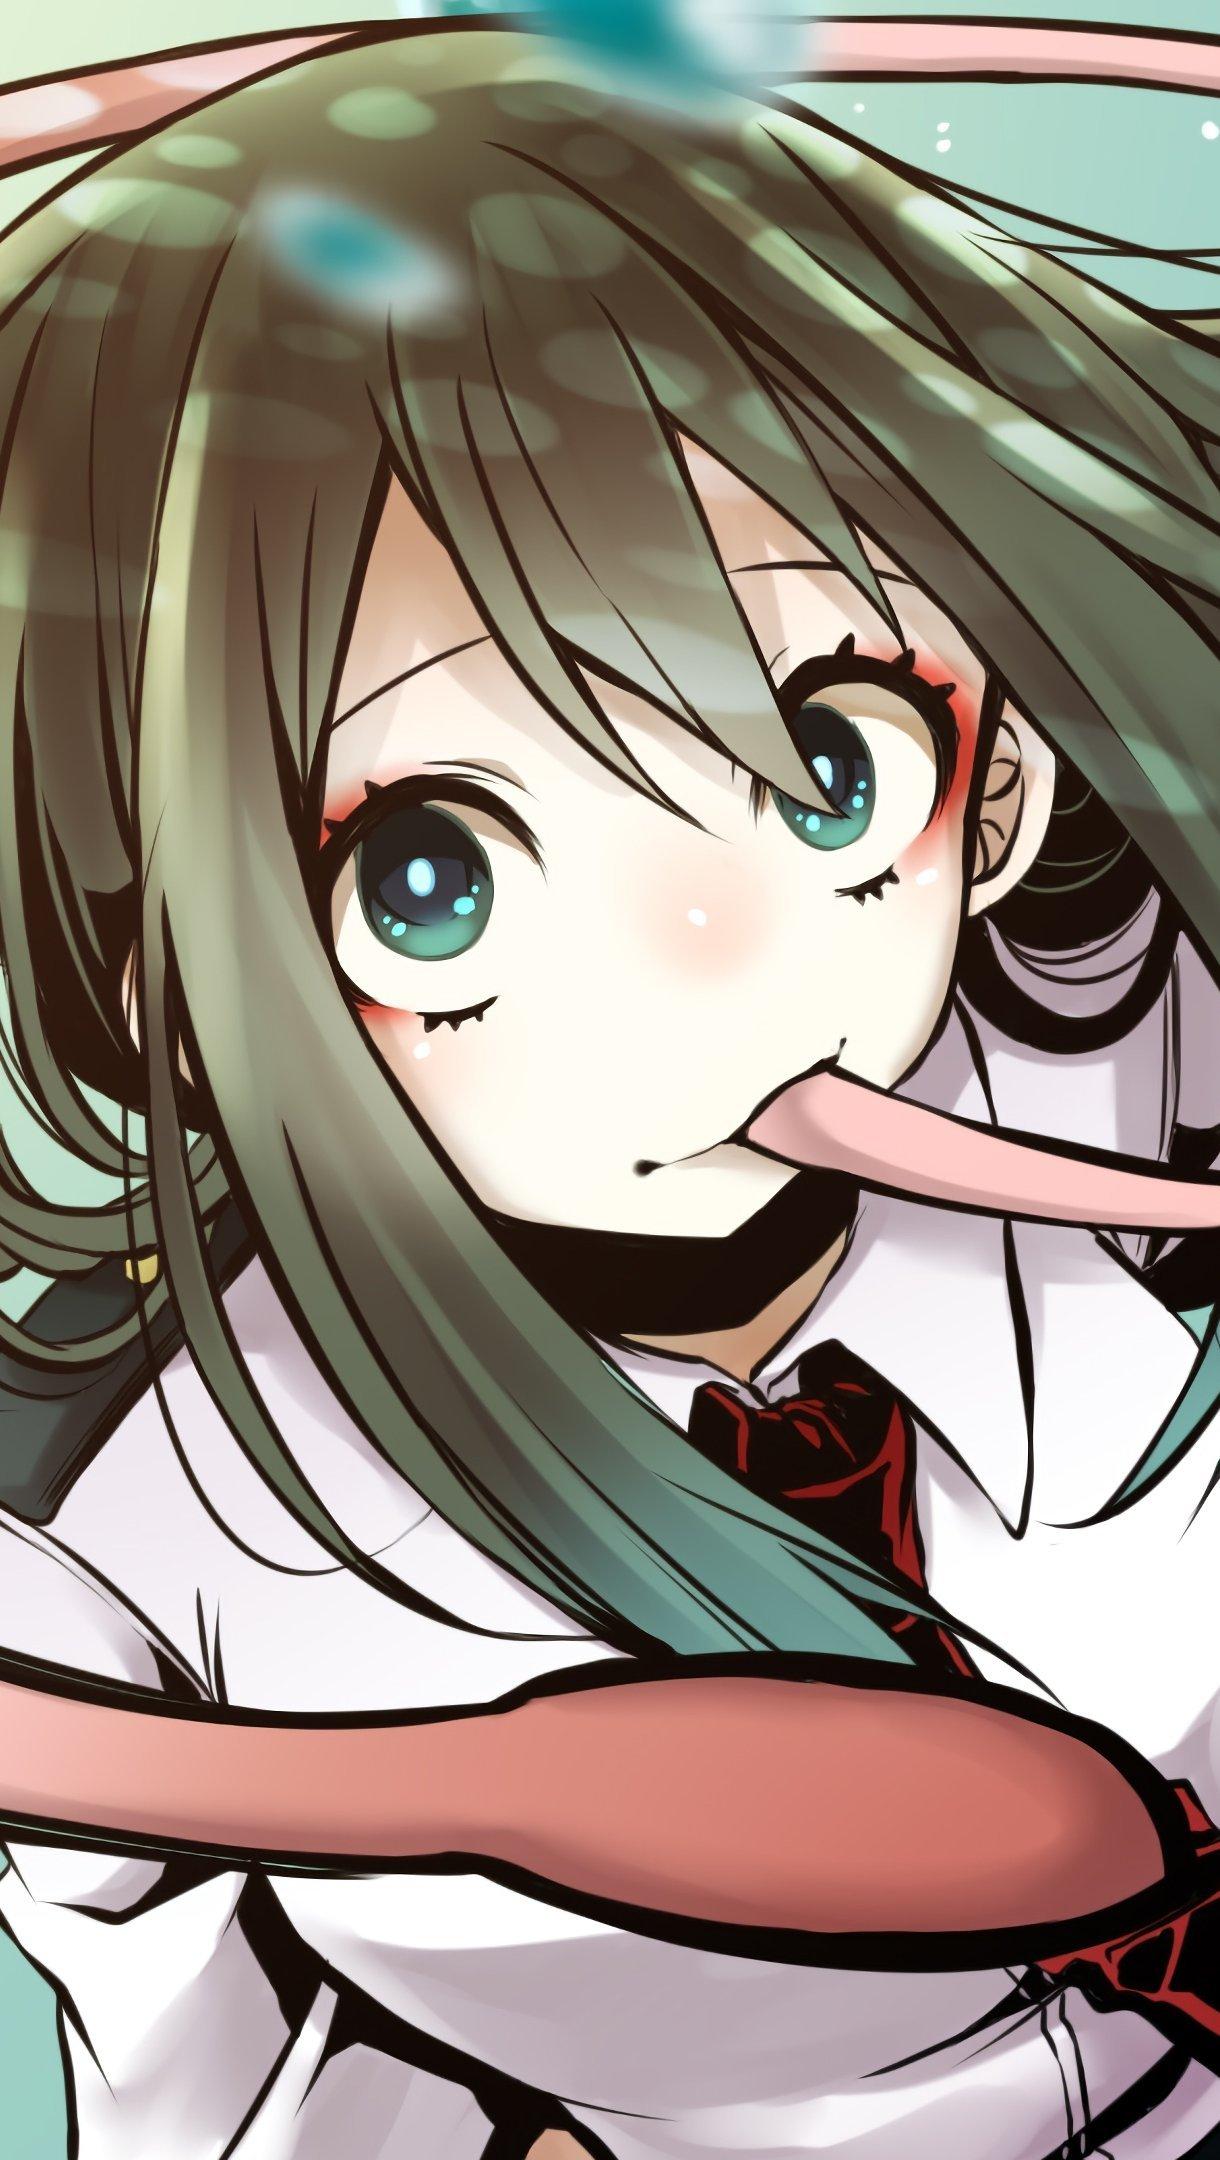 Anime Wallpaper Tsuyu Asui My Hero Academia Vertical